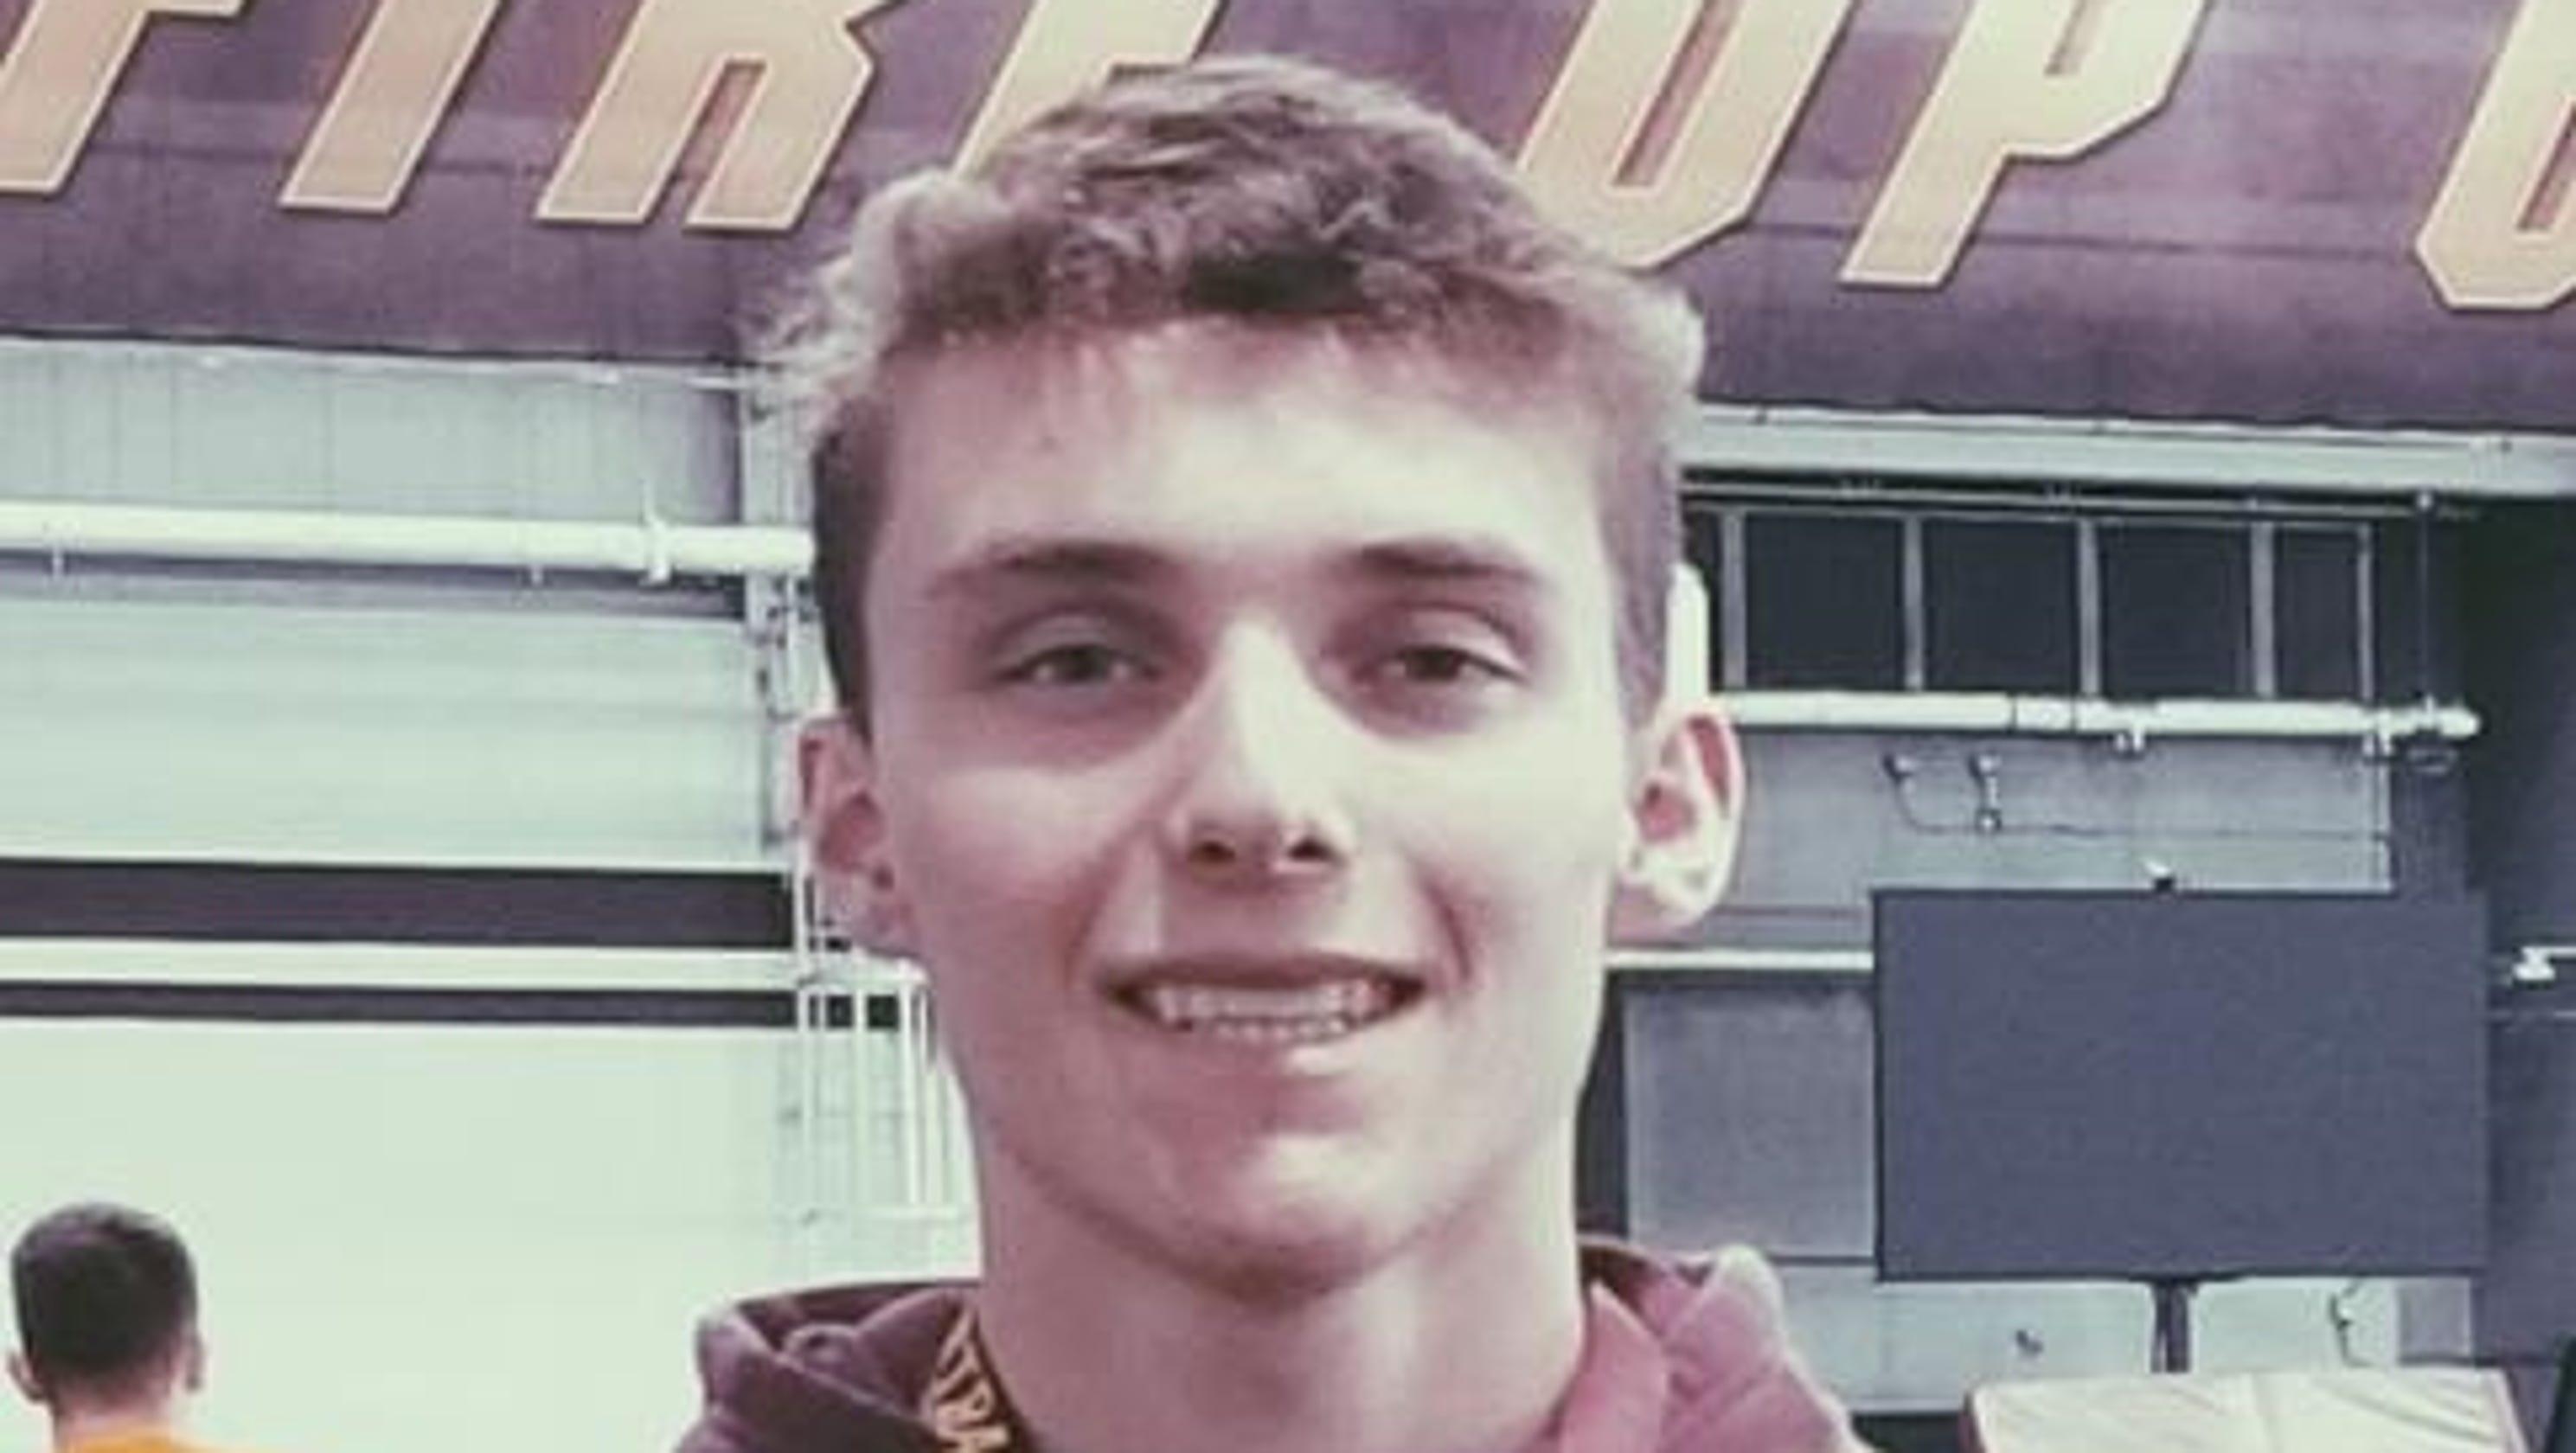 Best Kicker 2020 Eaton Rapids' Marshall Meeder rises into elite kicking prospect